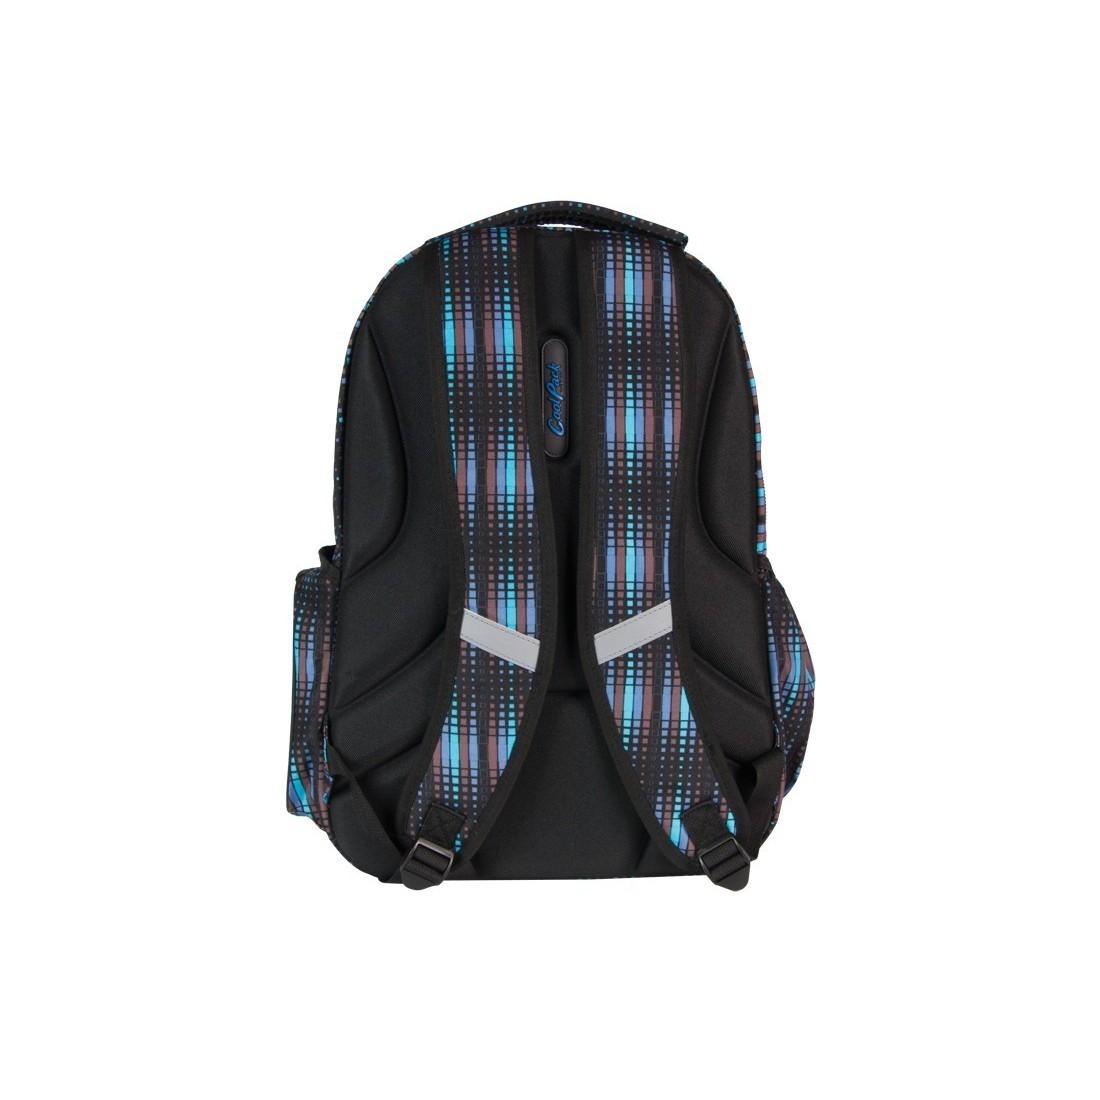 PLECAK COOLPACK MŁODZIEŻOWY Niebiesko- Czarny LEADER BLUE FLASH CP 231 - plecak-tornister.pl